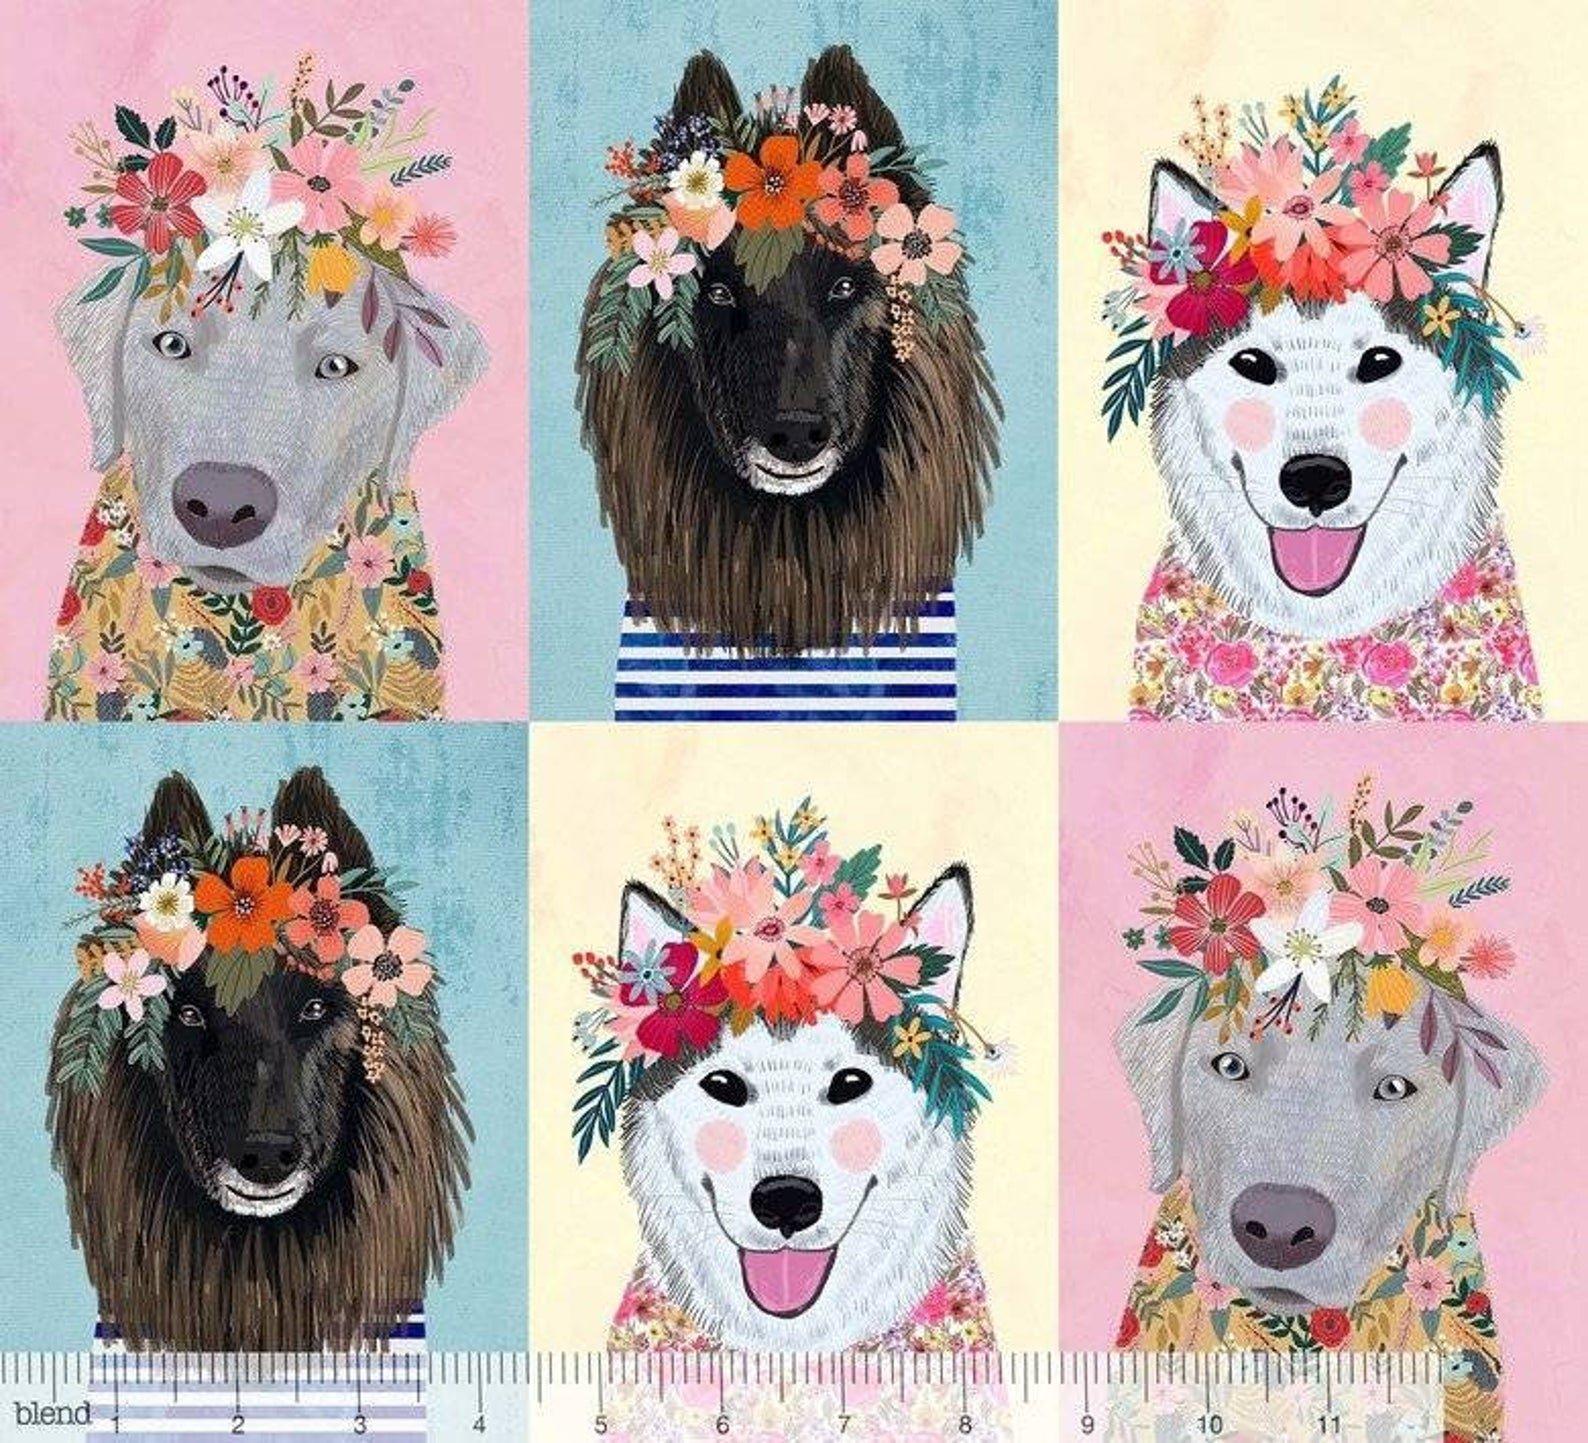 Mia Charro More Floral Pets - Floral Puppies